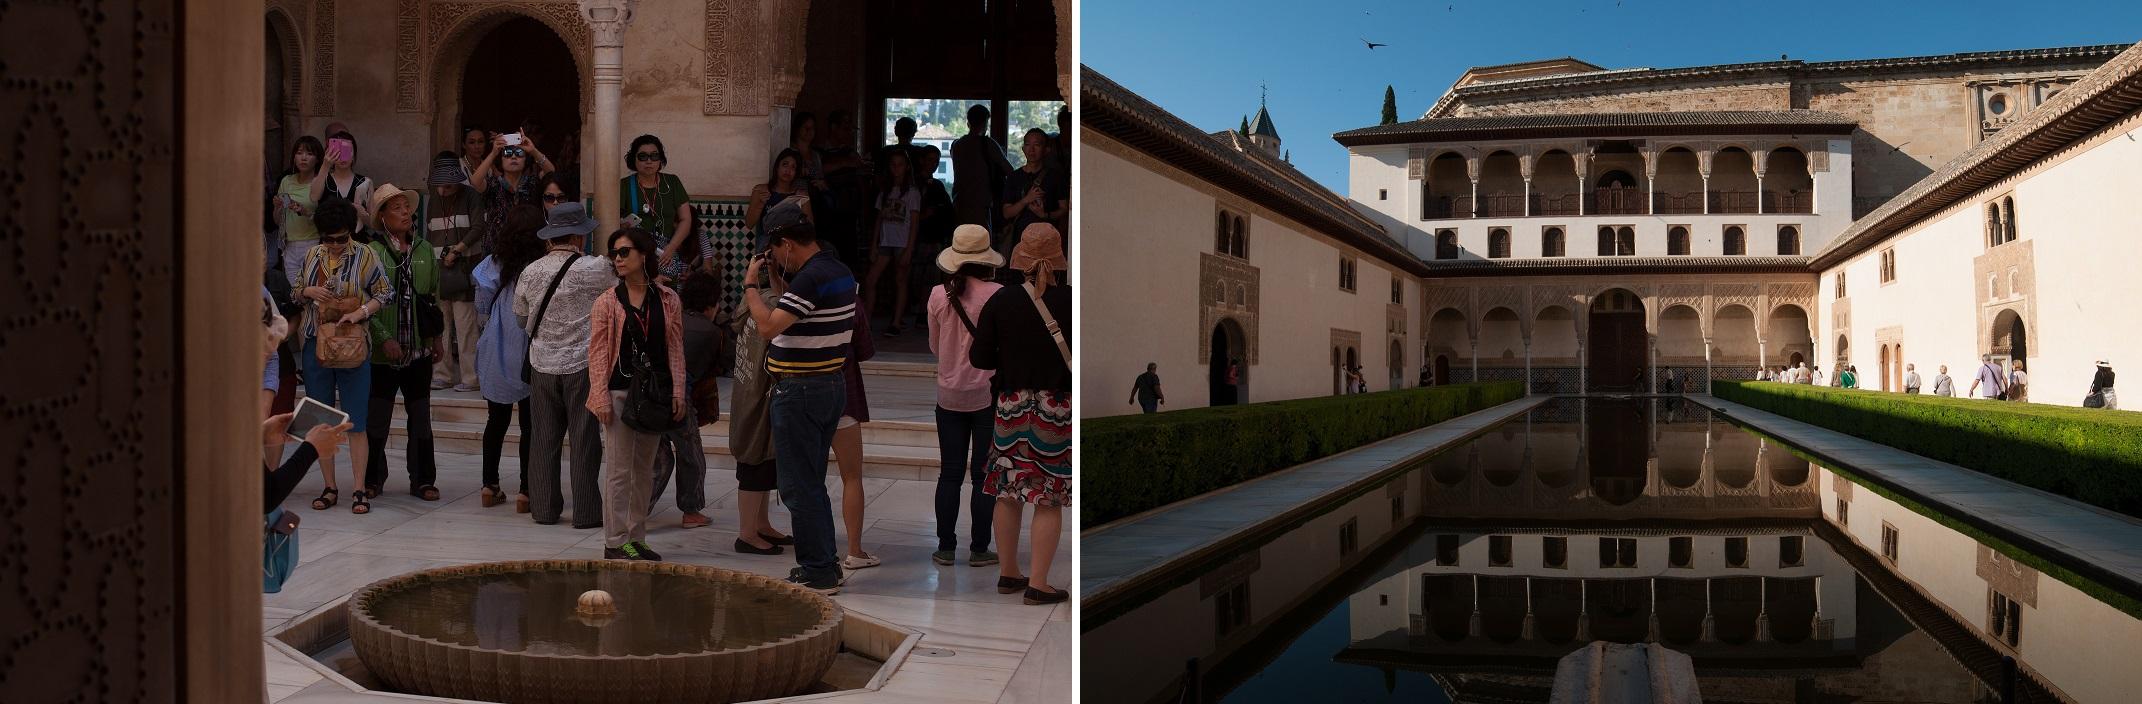 monde-alhambra